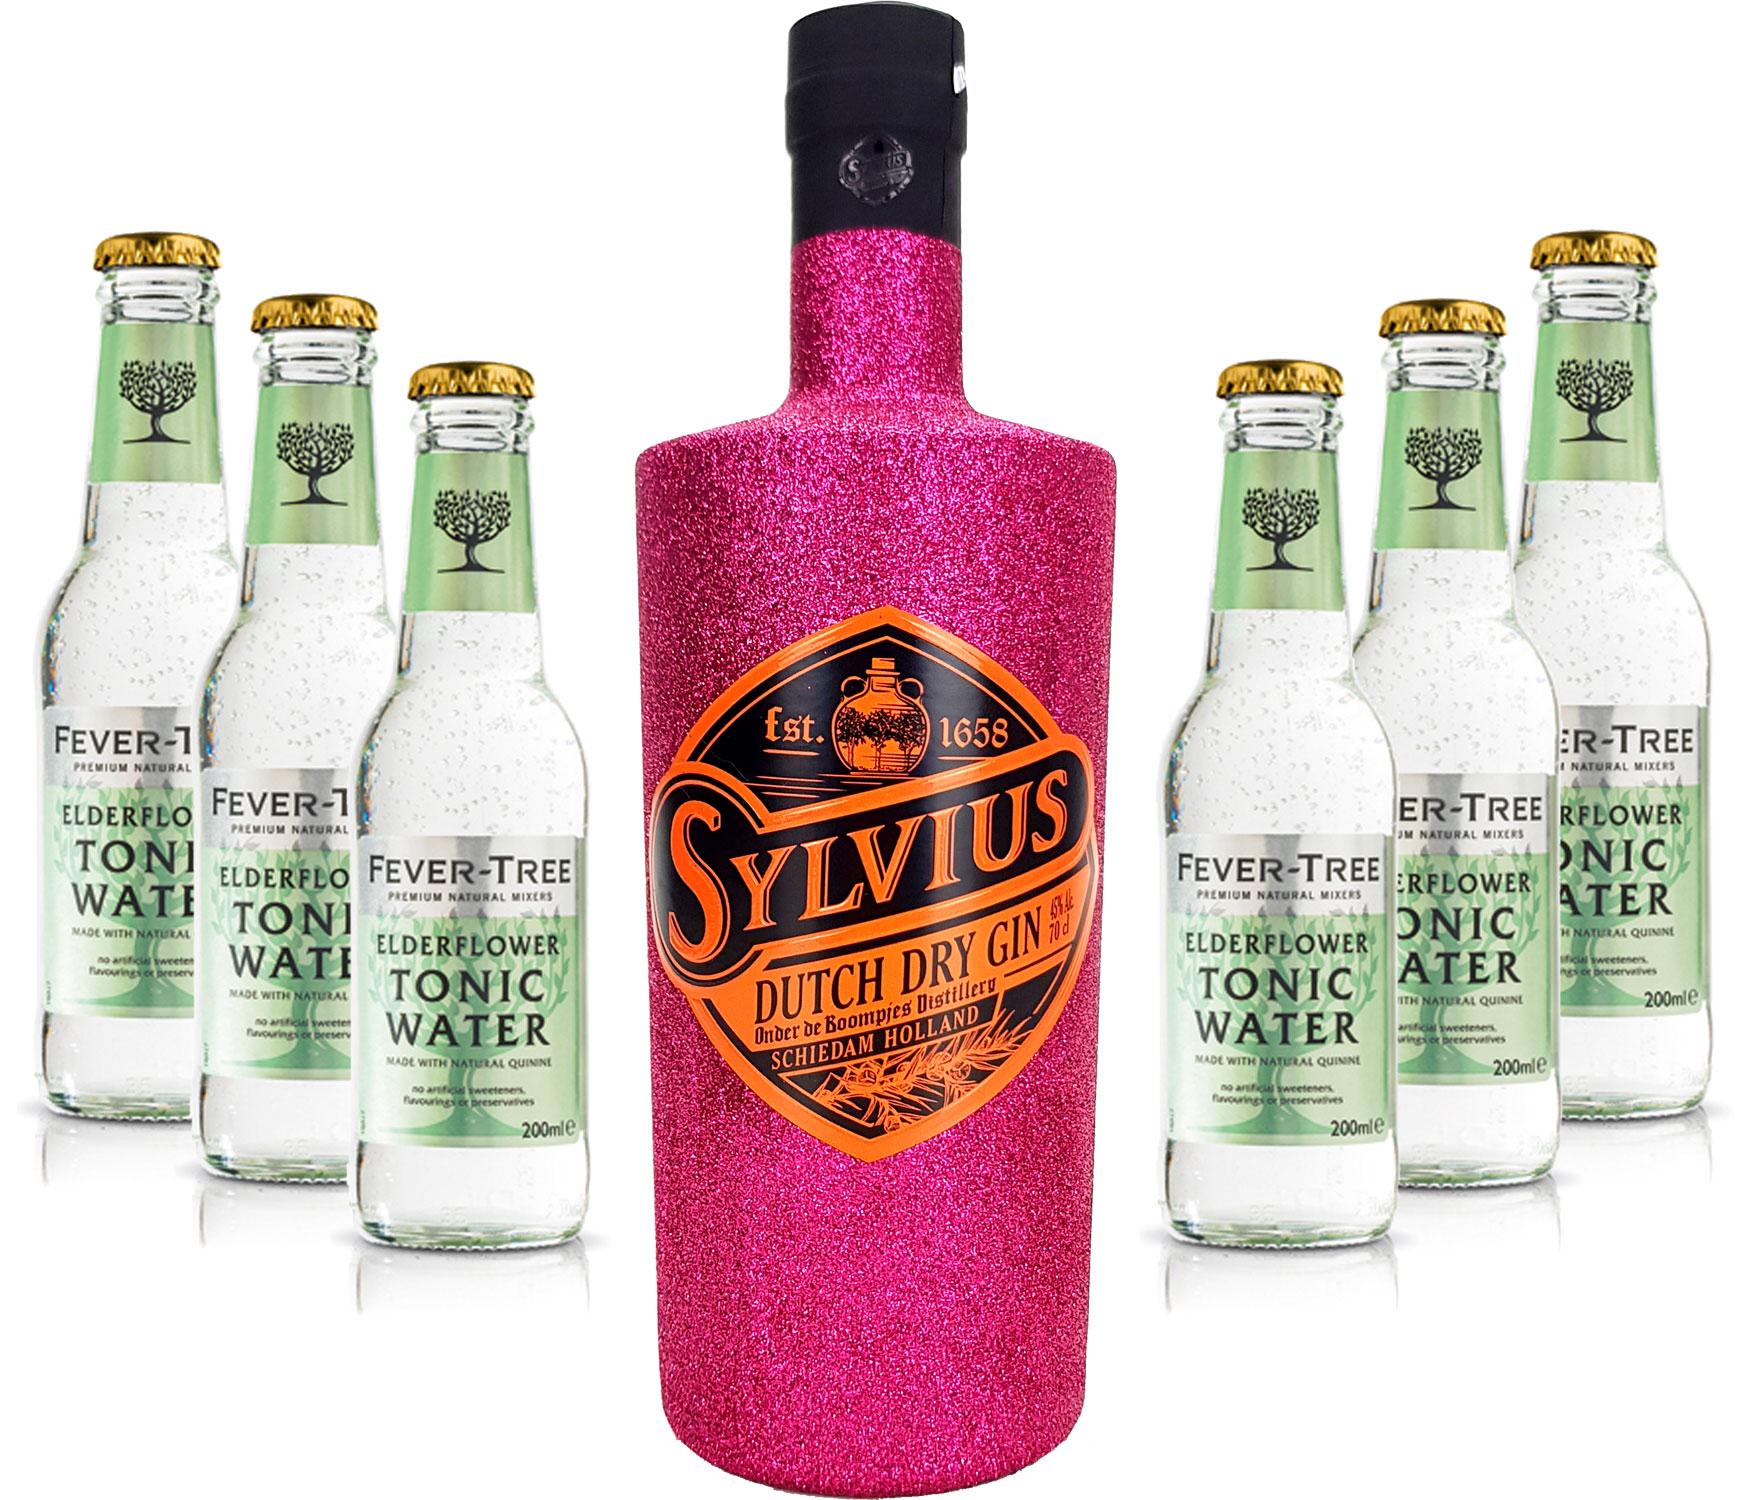 Gin Tonic Bling Bling Hot Pink Glitzer Set Geschenkset - Sylvius Dutch Gin 0,7l 700ml (45% Vol) + 6x Fever Tree Elderflower Tonic Water 200ml inkl. Pfand MEHRWEG -[Enthält Sulfite]